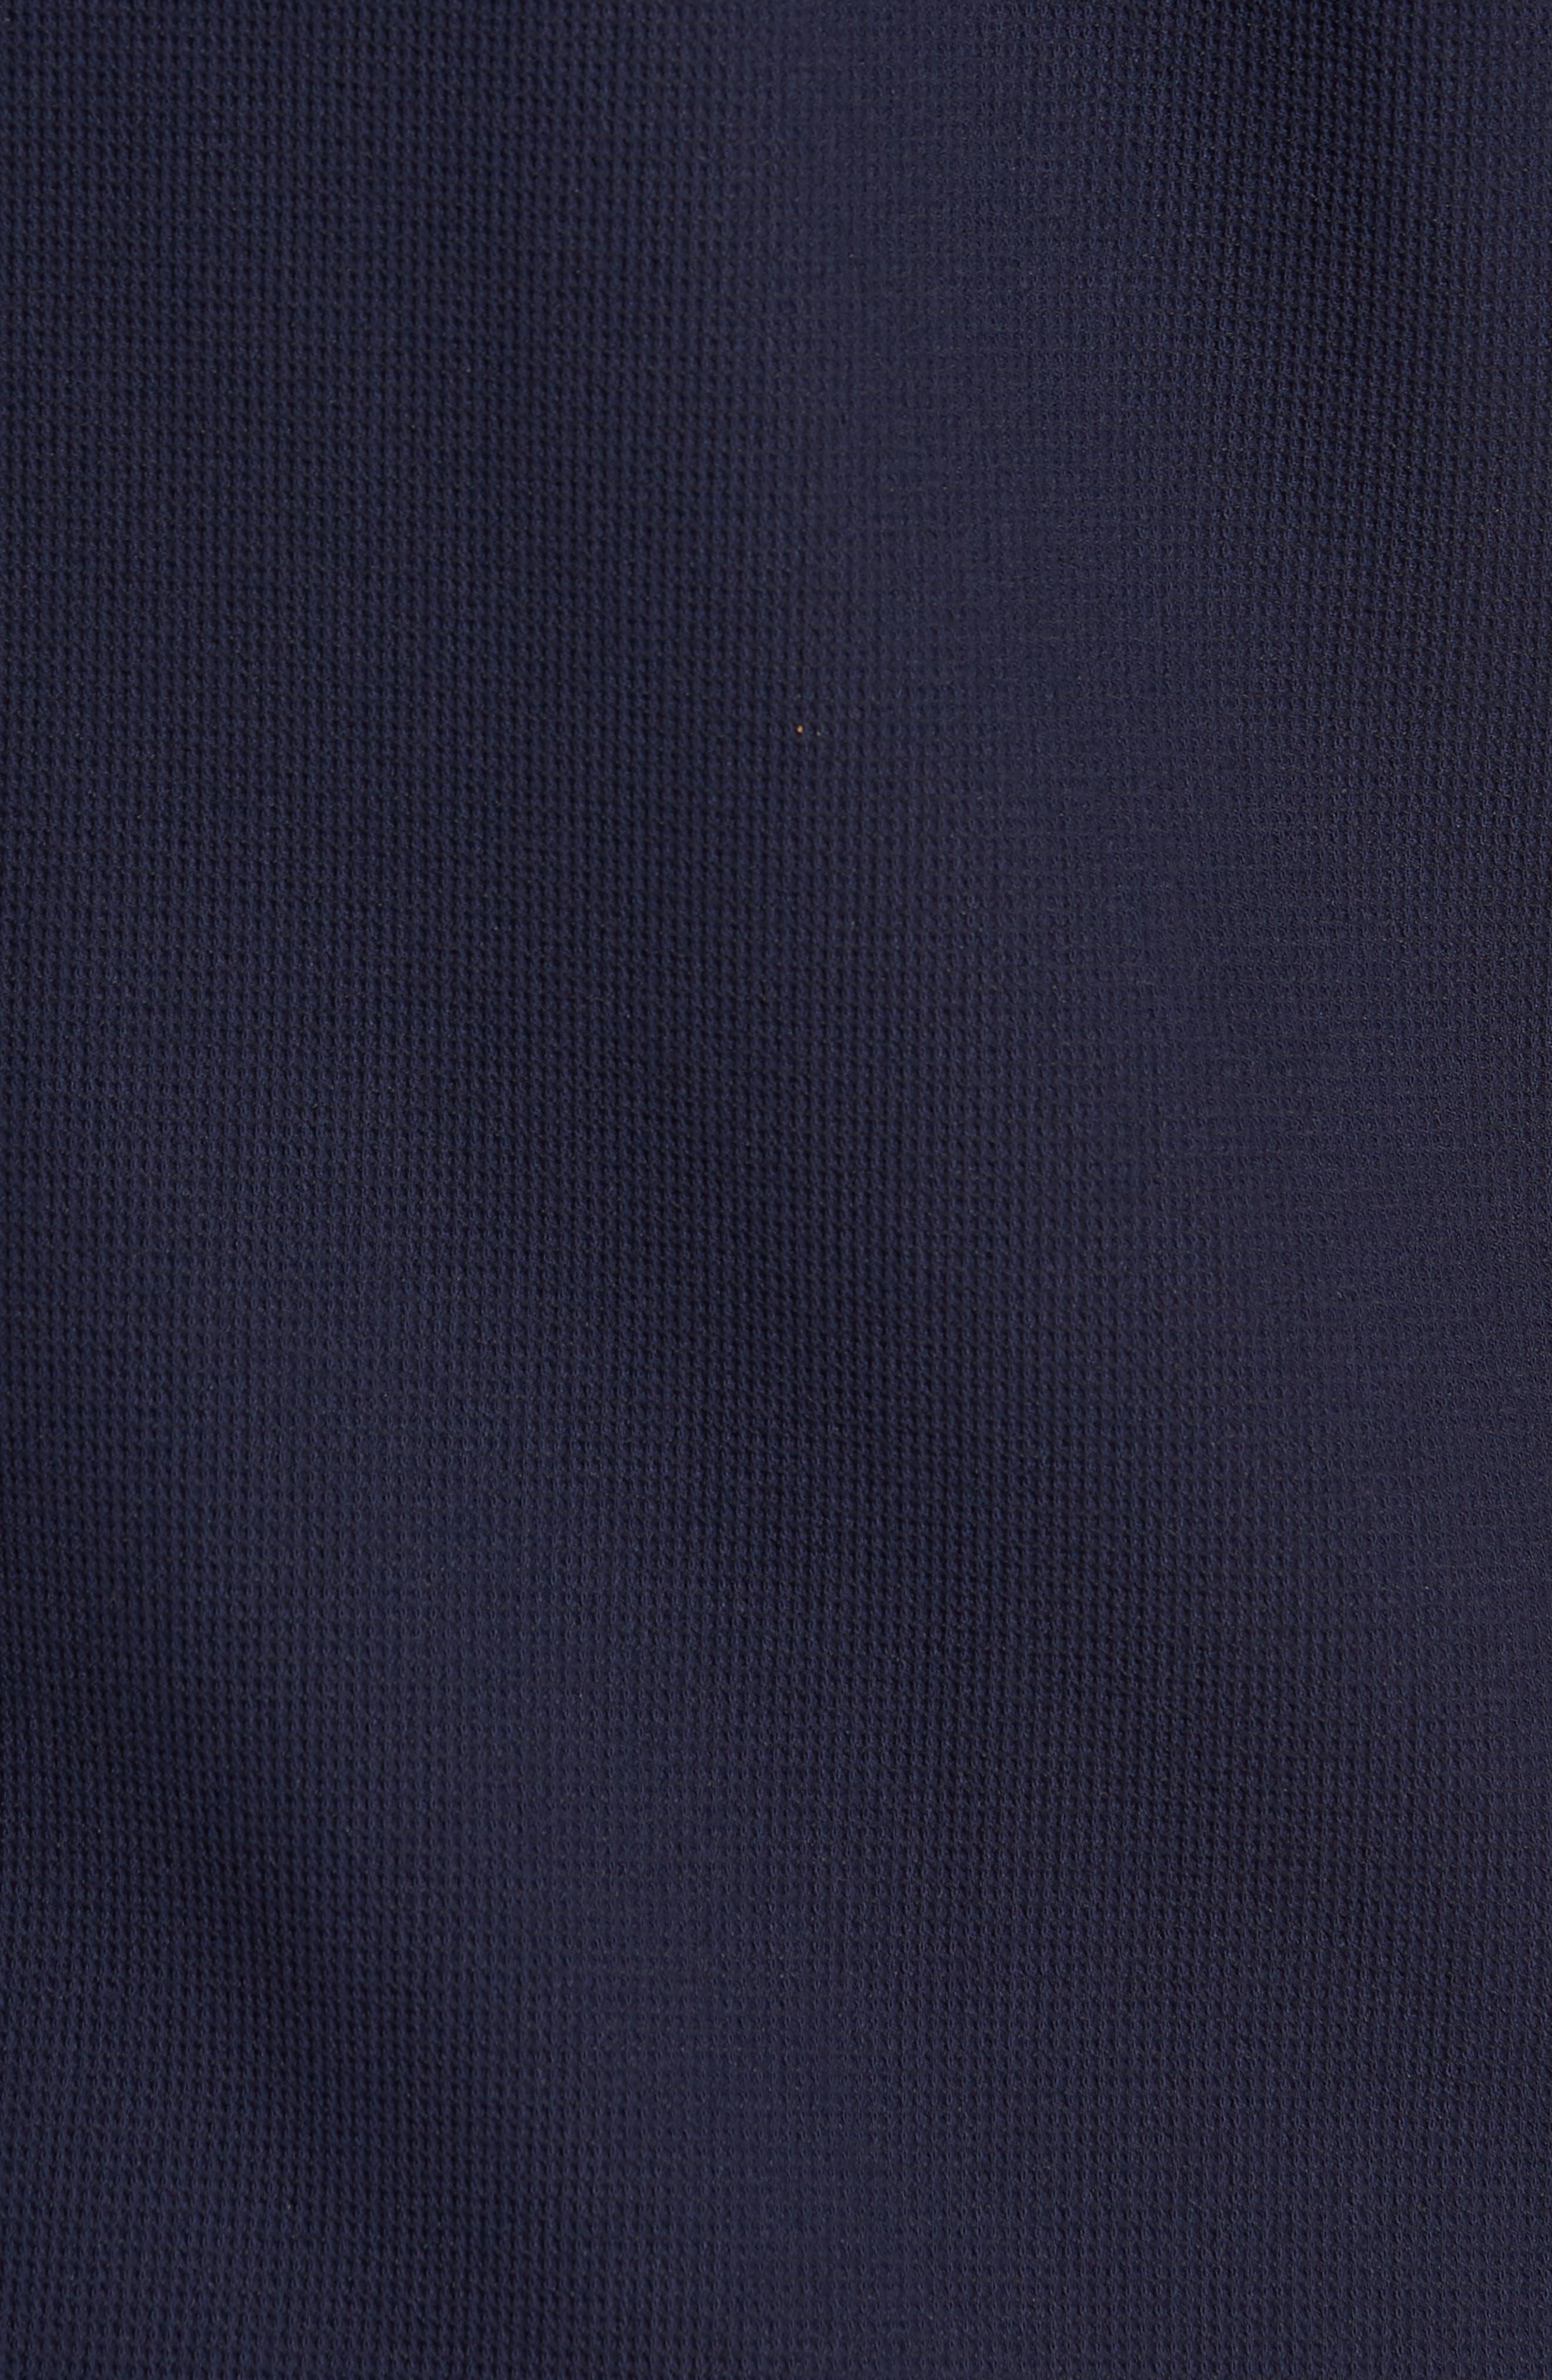 Loretax Trim Fit Stretch Knit Sport Shirt,                             Alternate thumbnail 5, color,                             Navy